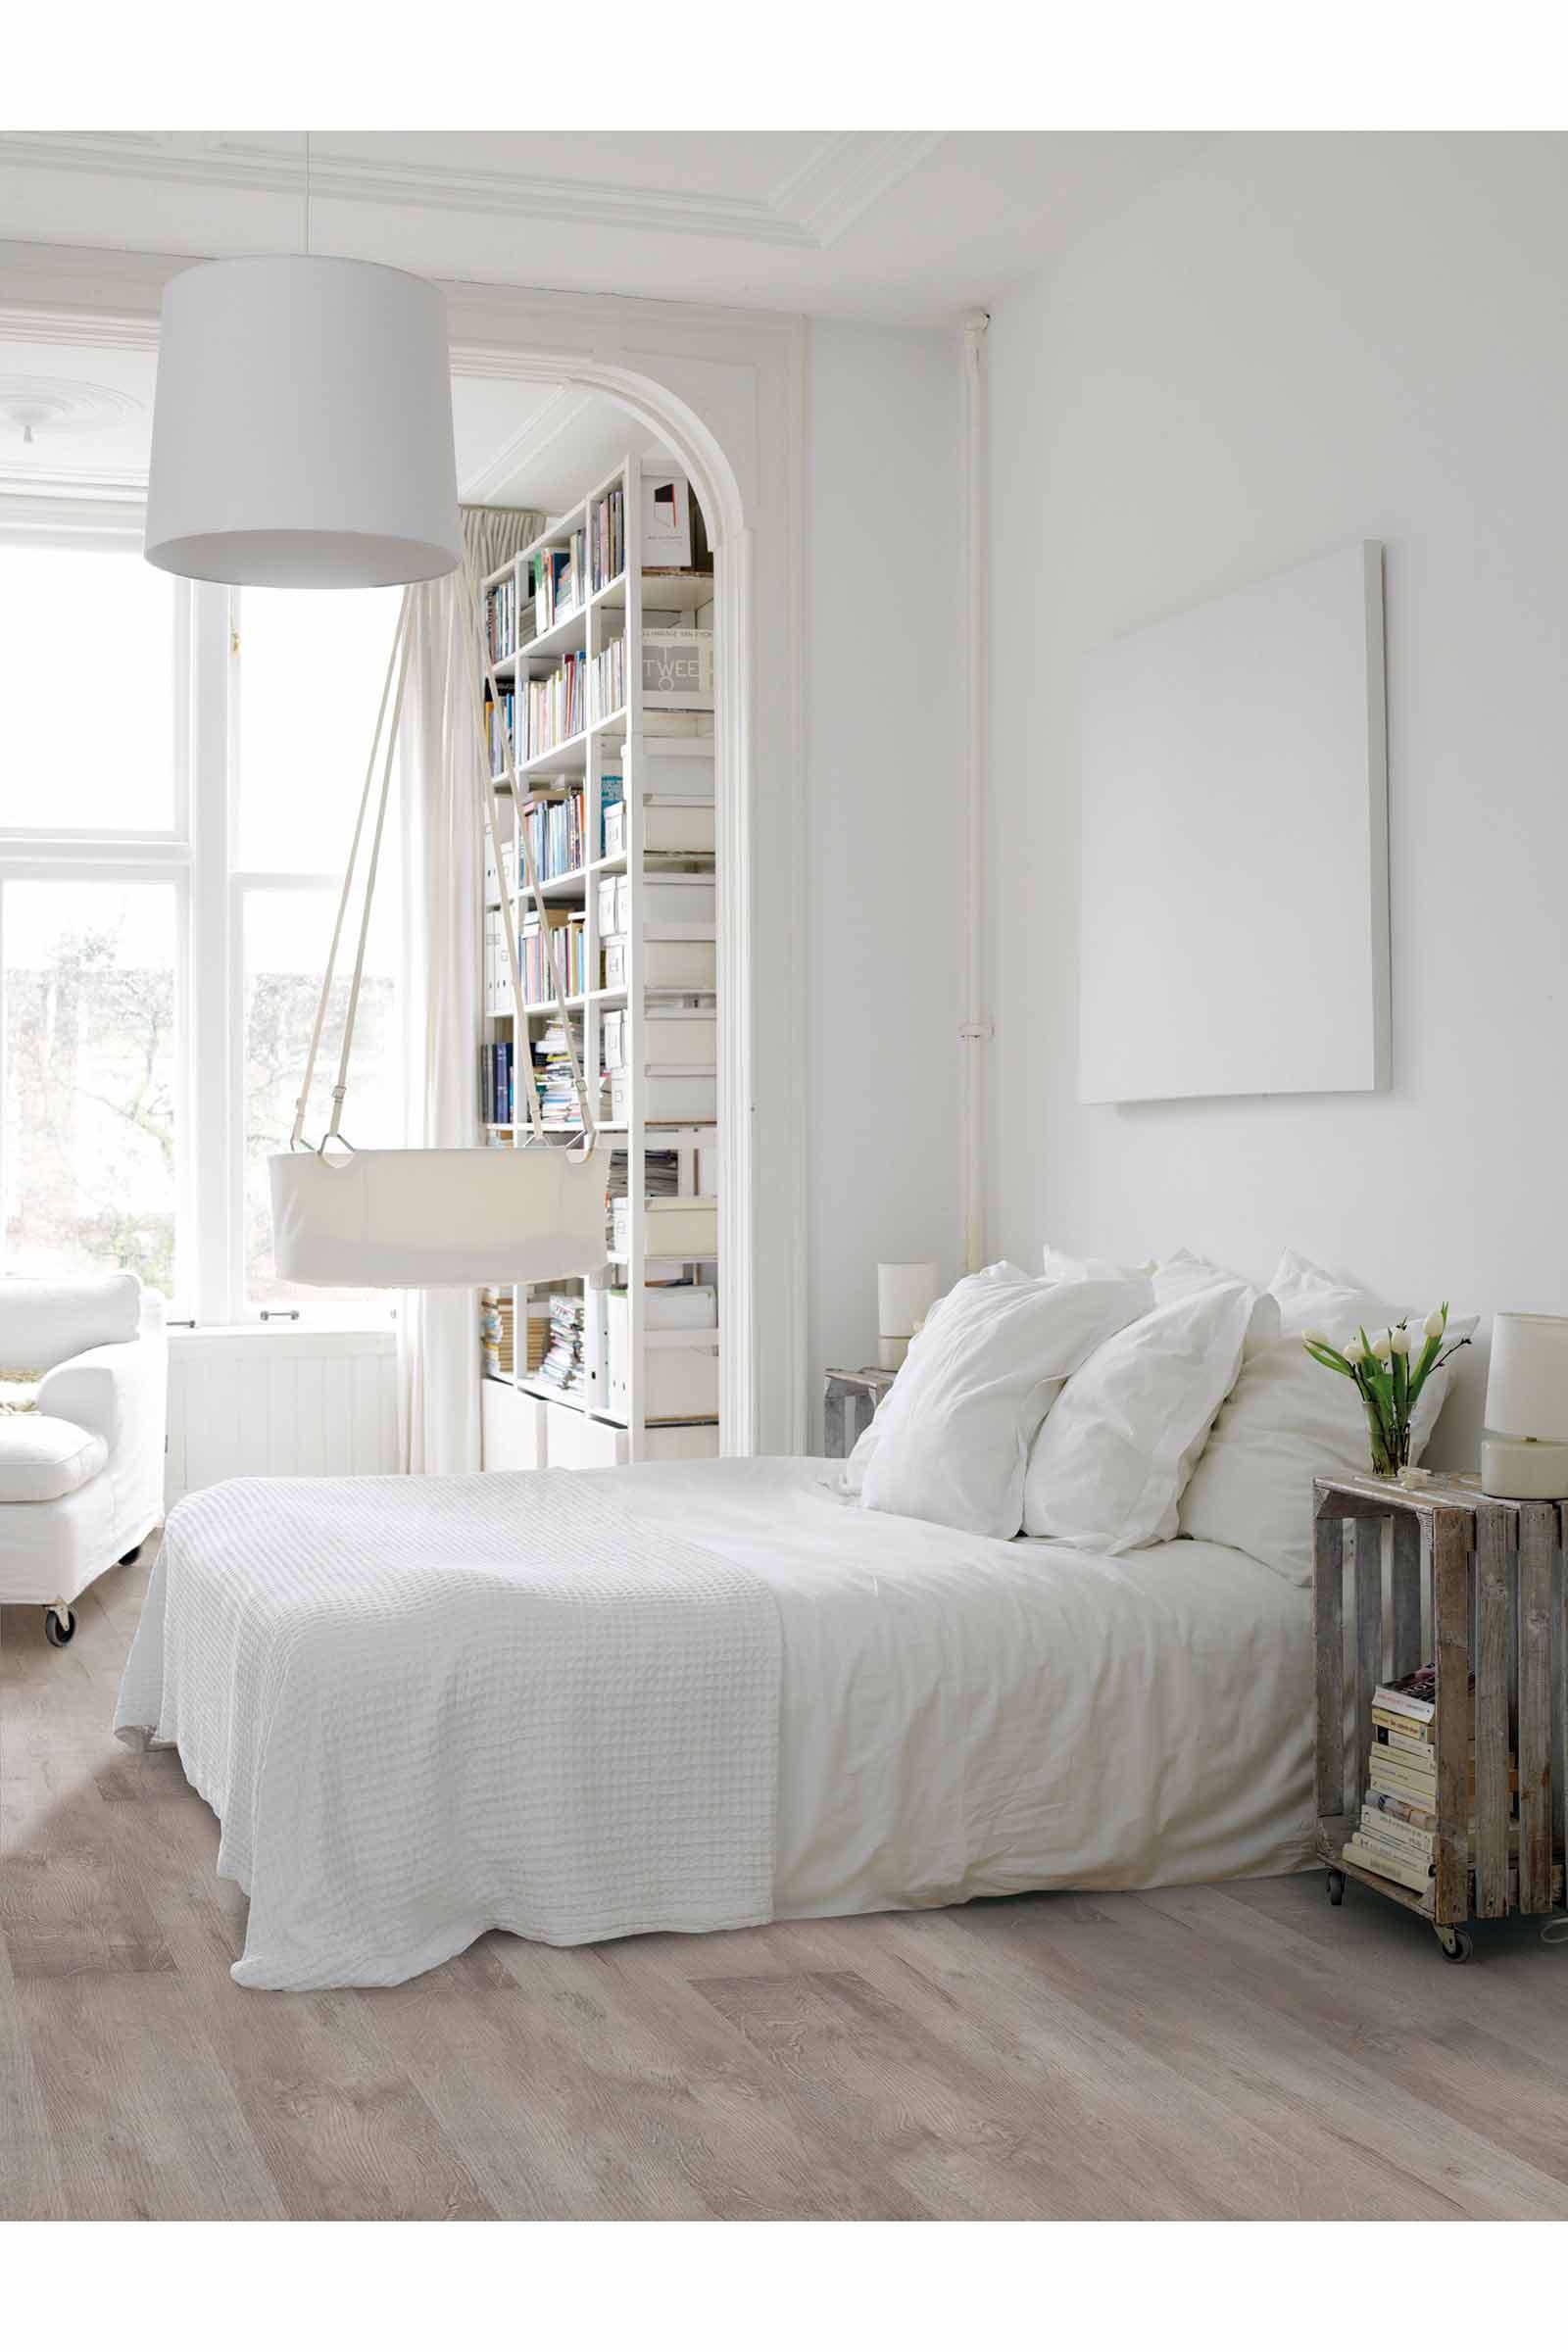 Stunning Flexfloor Badkamer Pictures - Interior Design Ideas ...